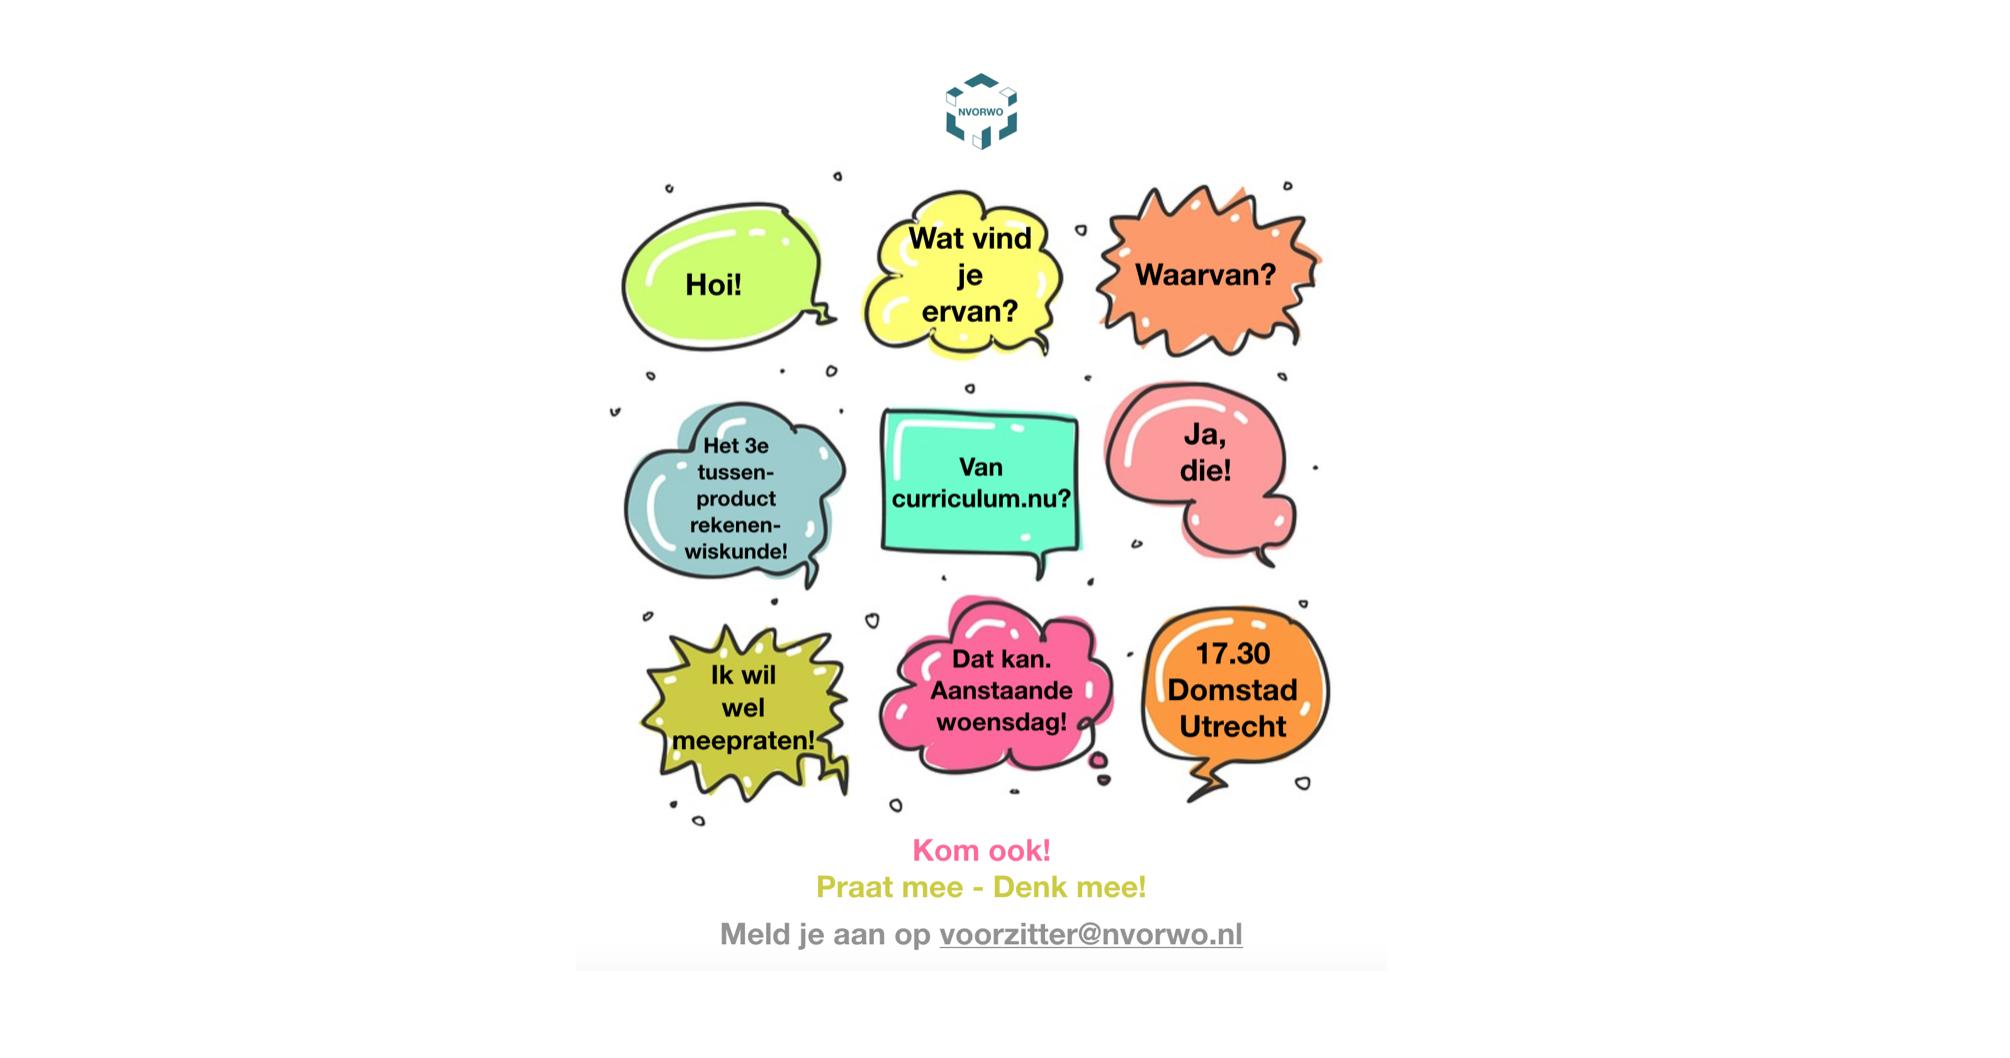 feedback-bijeenkomst 3e tussenproduct rekenen-wiskunde curricum.nu NVORWO